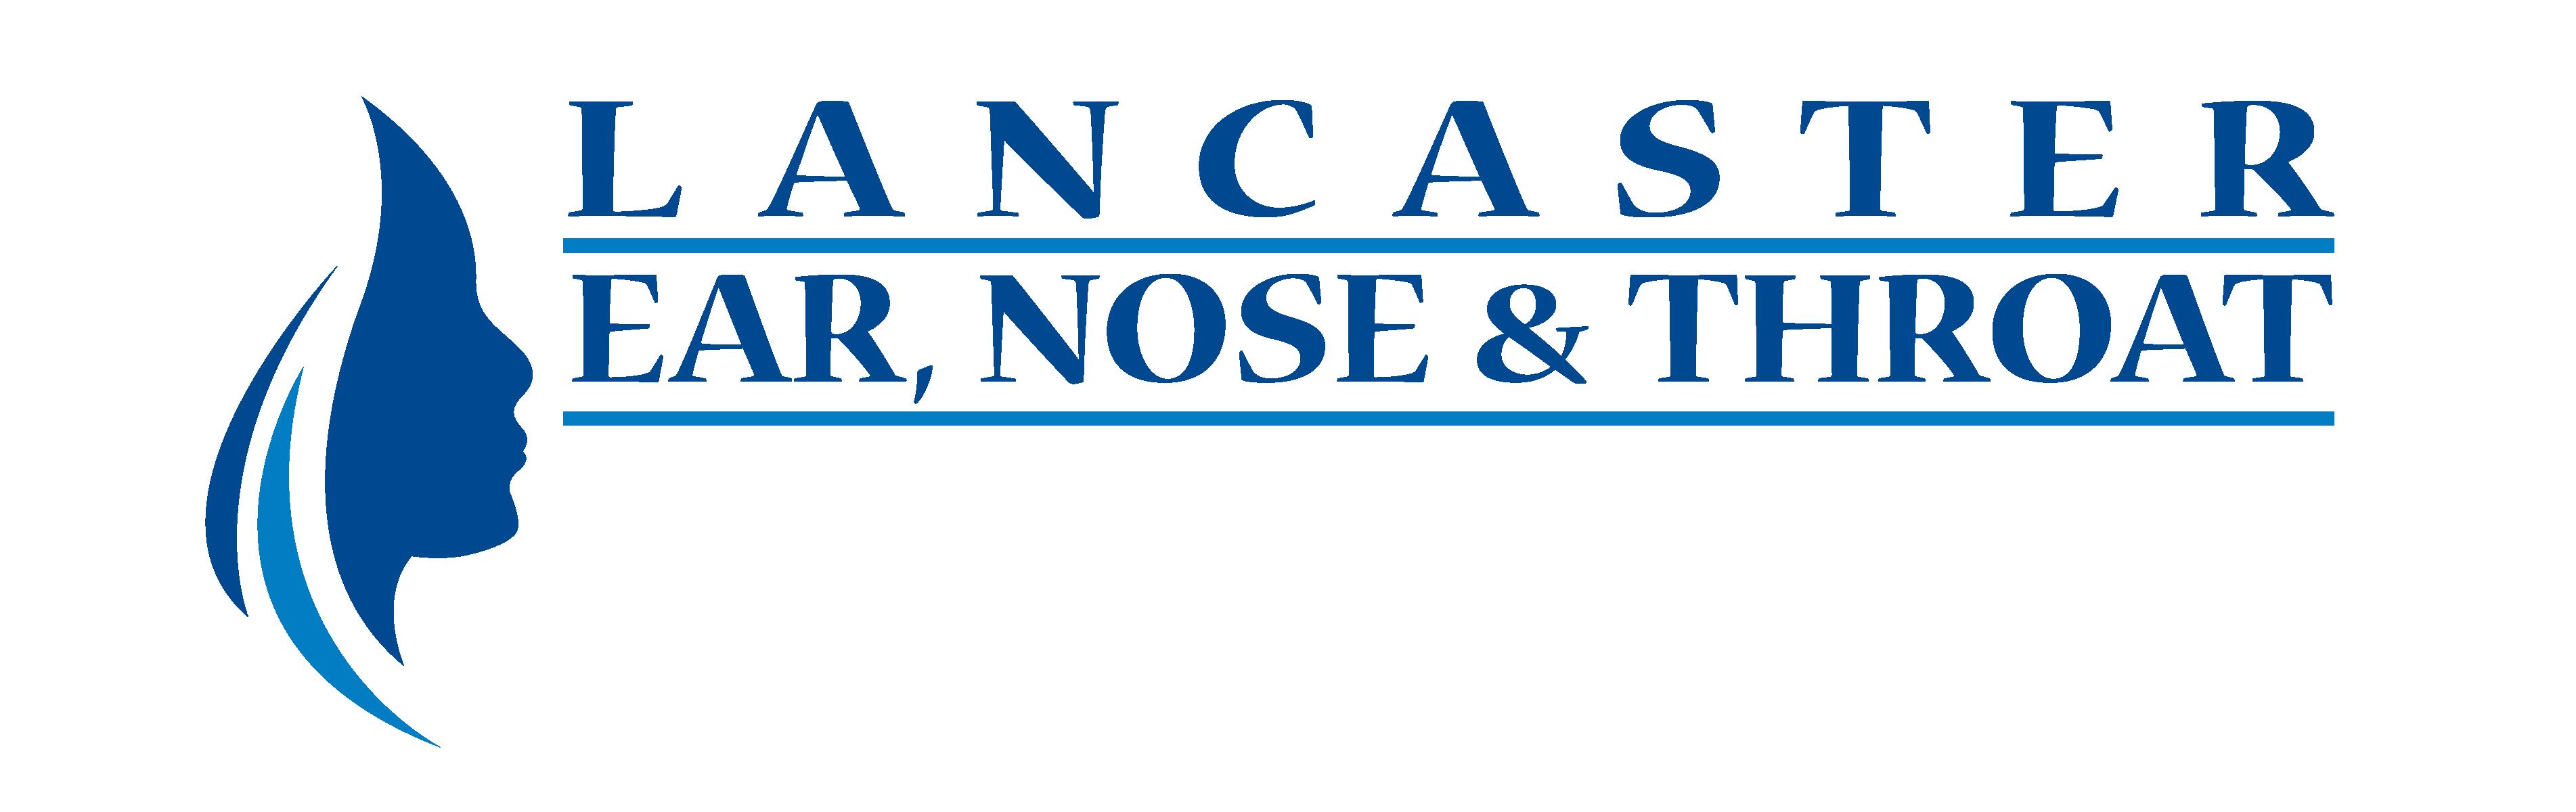 Lancaster Ear, Nose & Throat | Medical Disorders, Lancaster